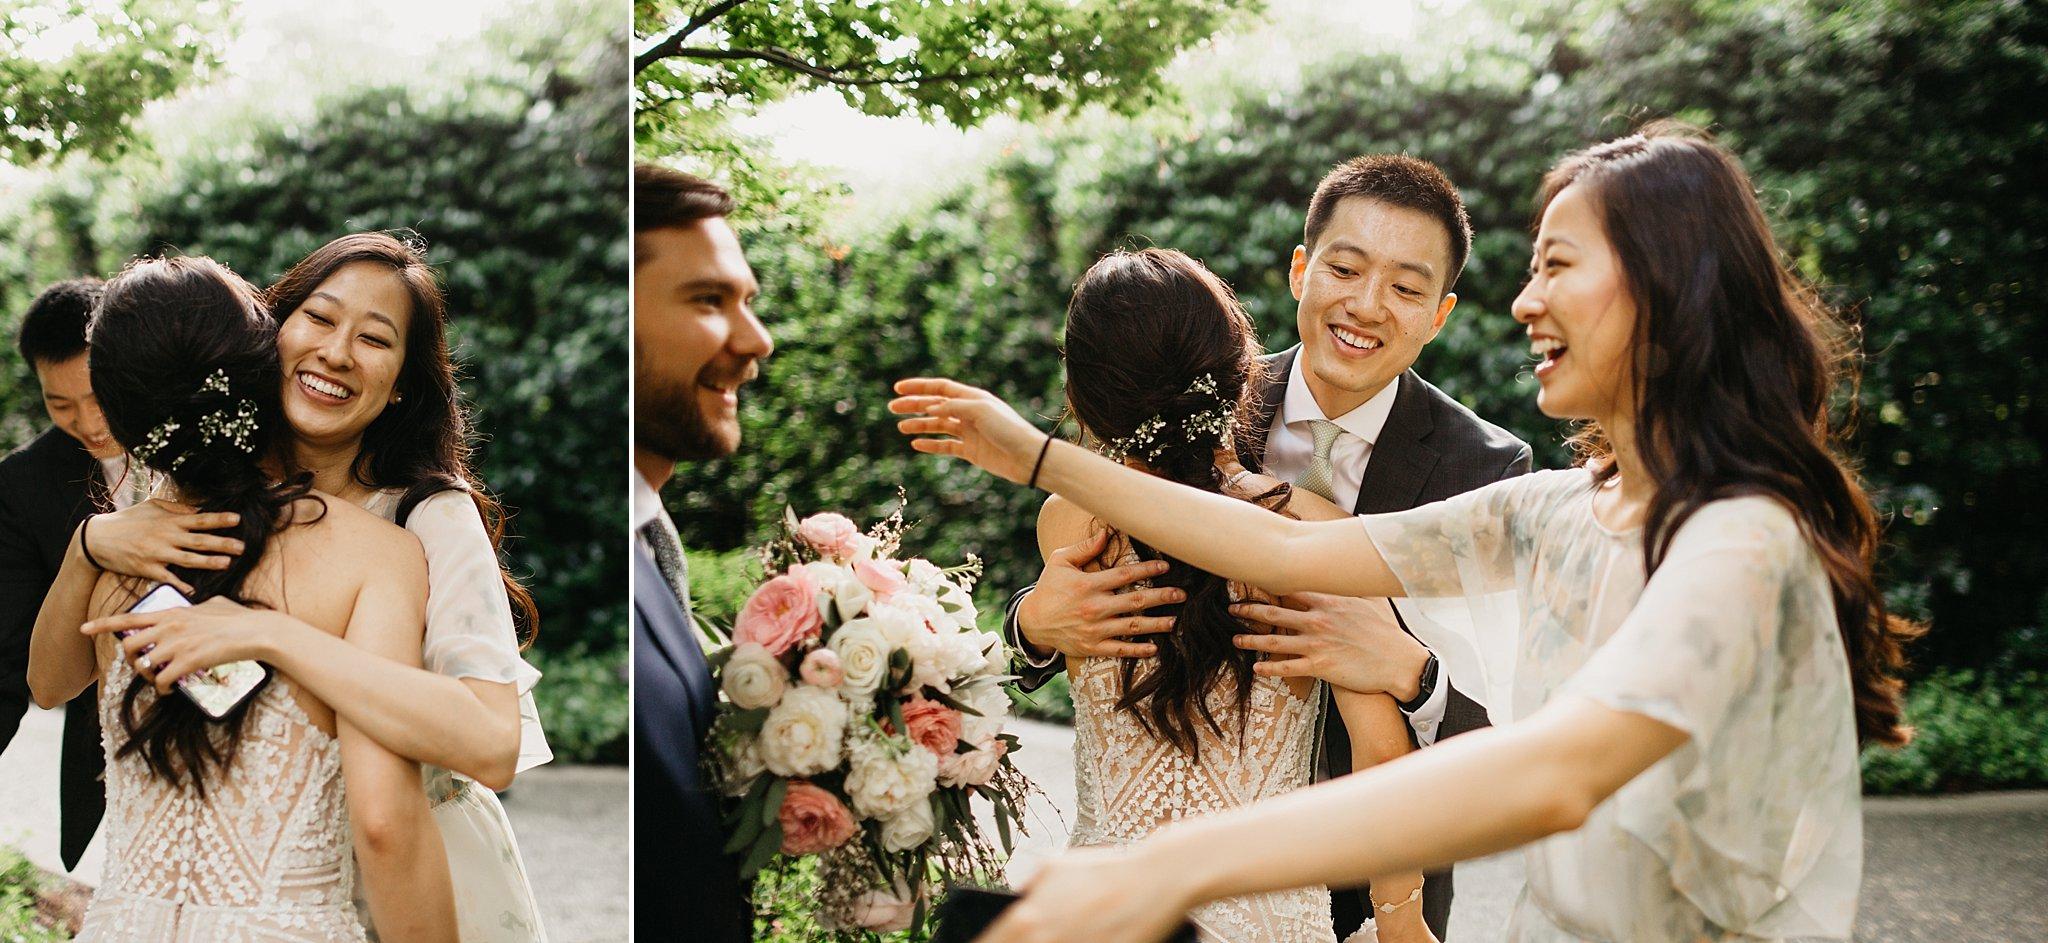 Wilderlove Co_Dallas Texas_Wedding Elopement_Arboretum_Photography_0010.jpg